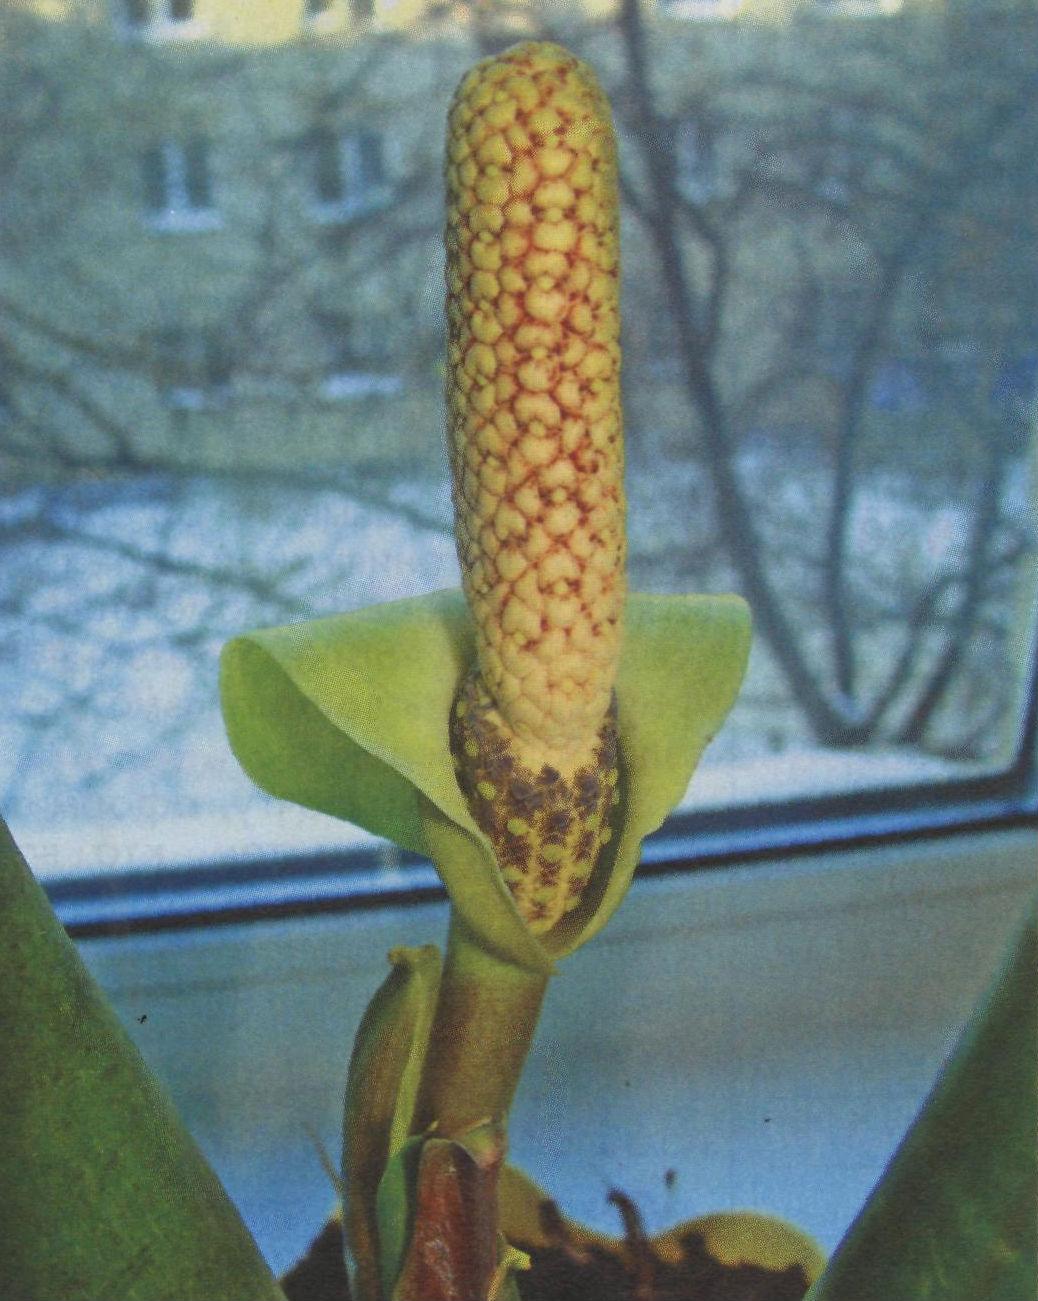 Цветок замиокулькас и его уход в домашних условиях фото